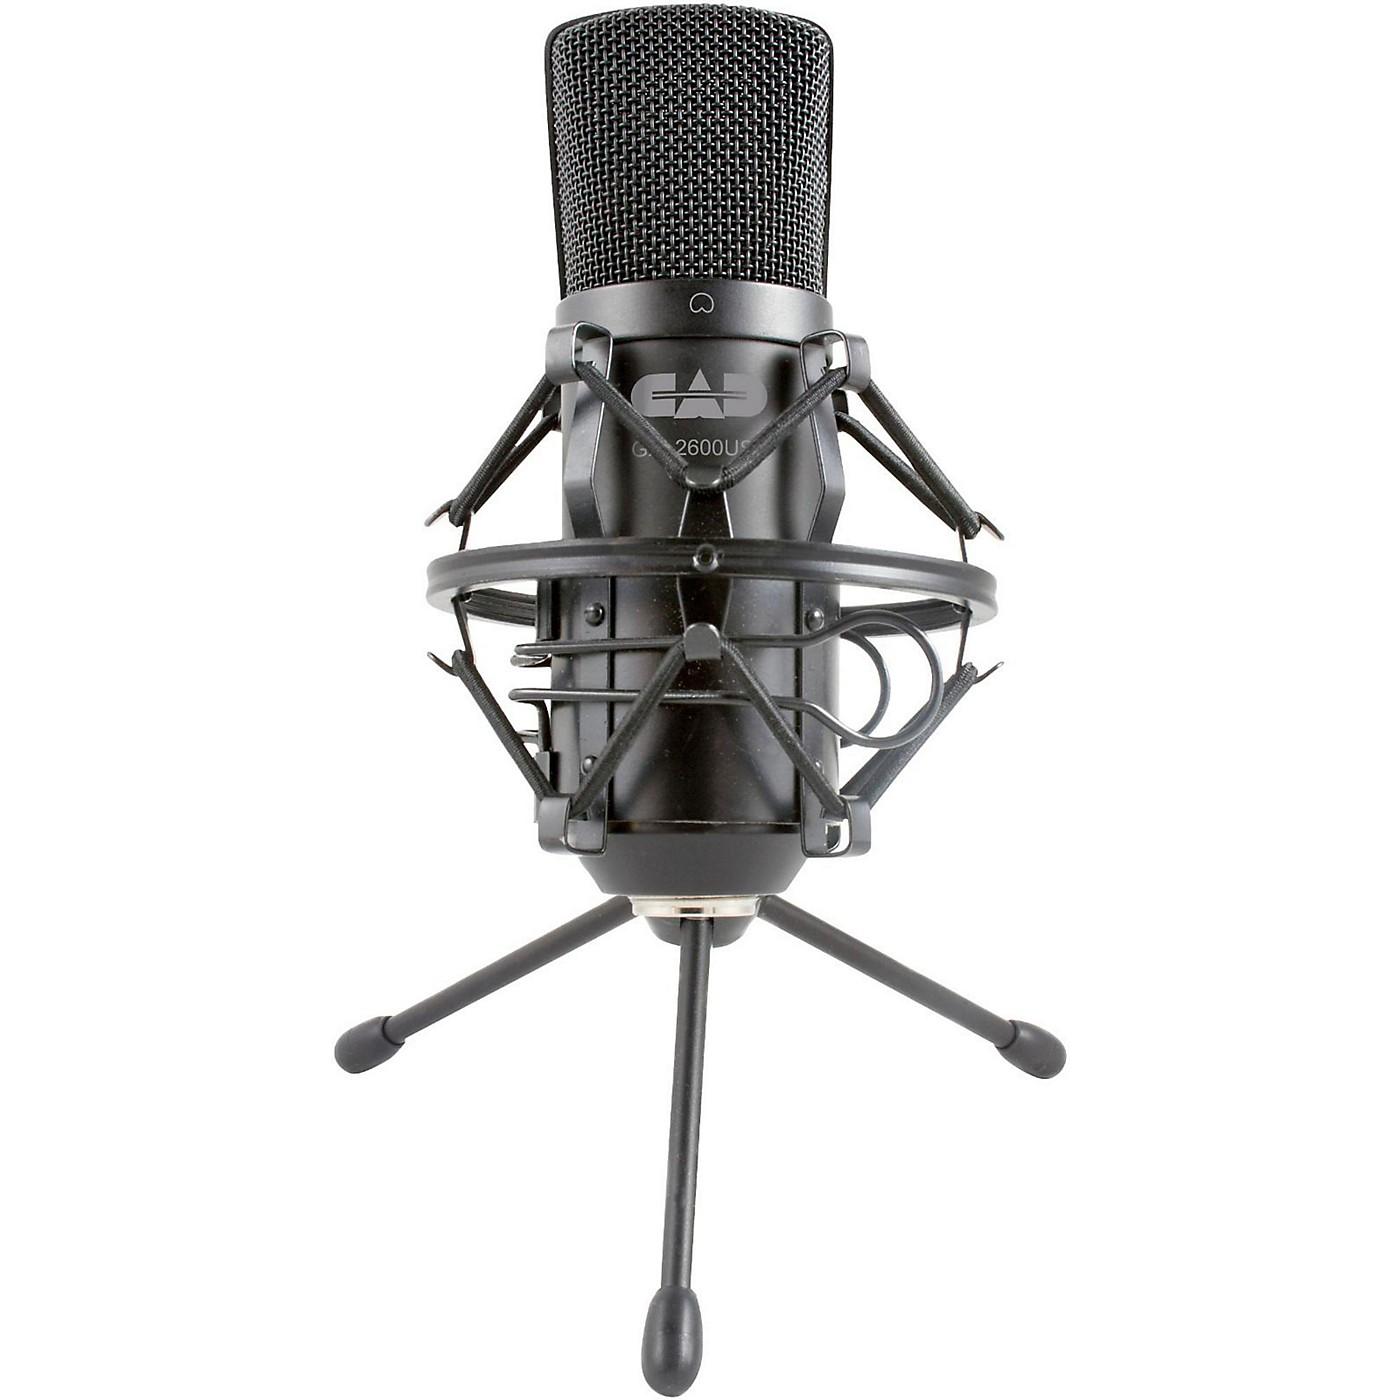 CAD GXL2600USB Large Diaphragm USB Studio Condenser Microphone thumbnail